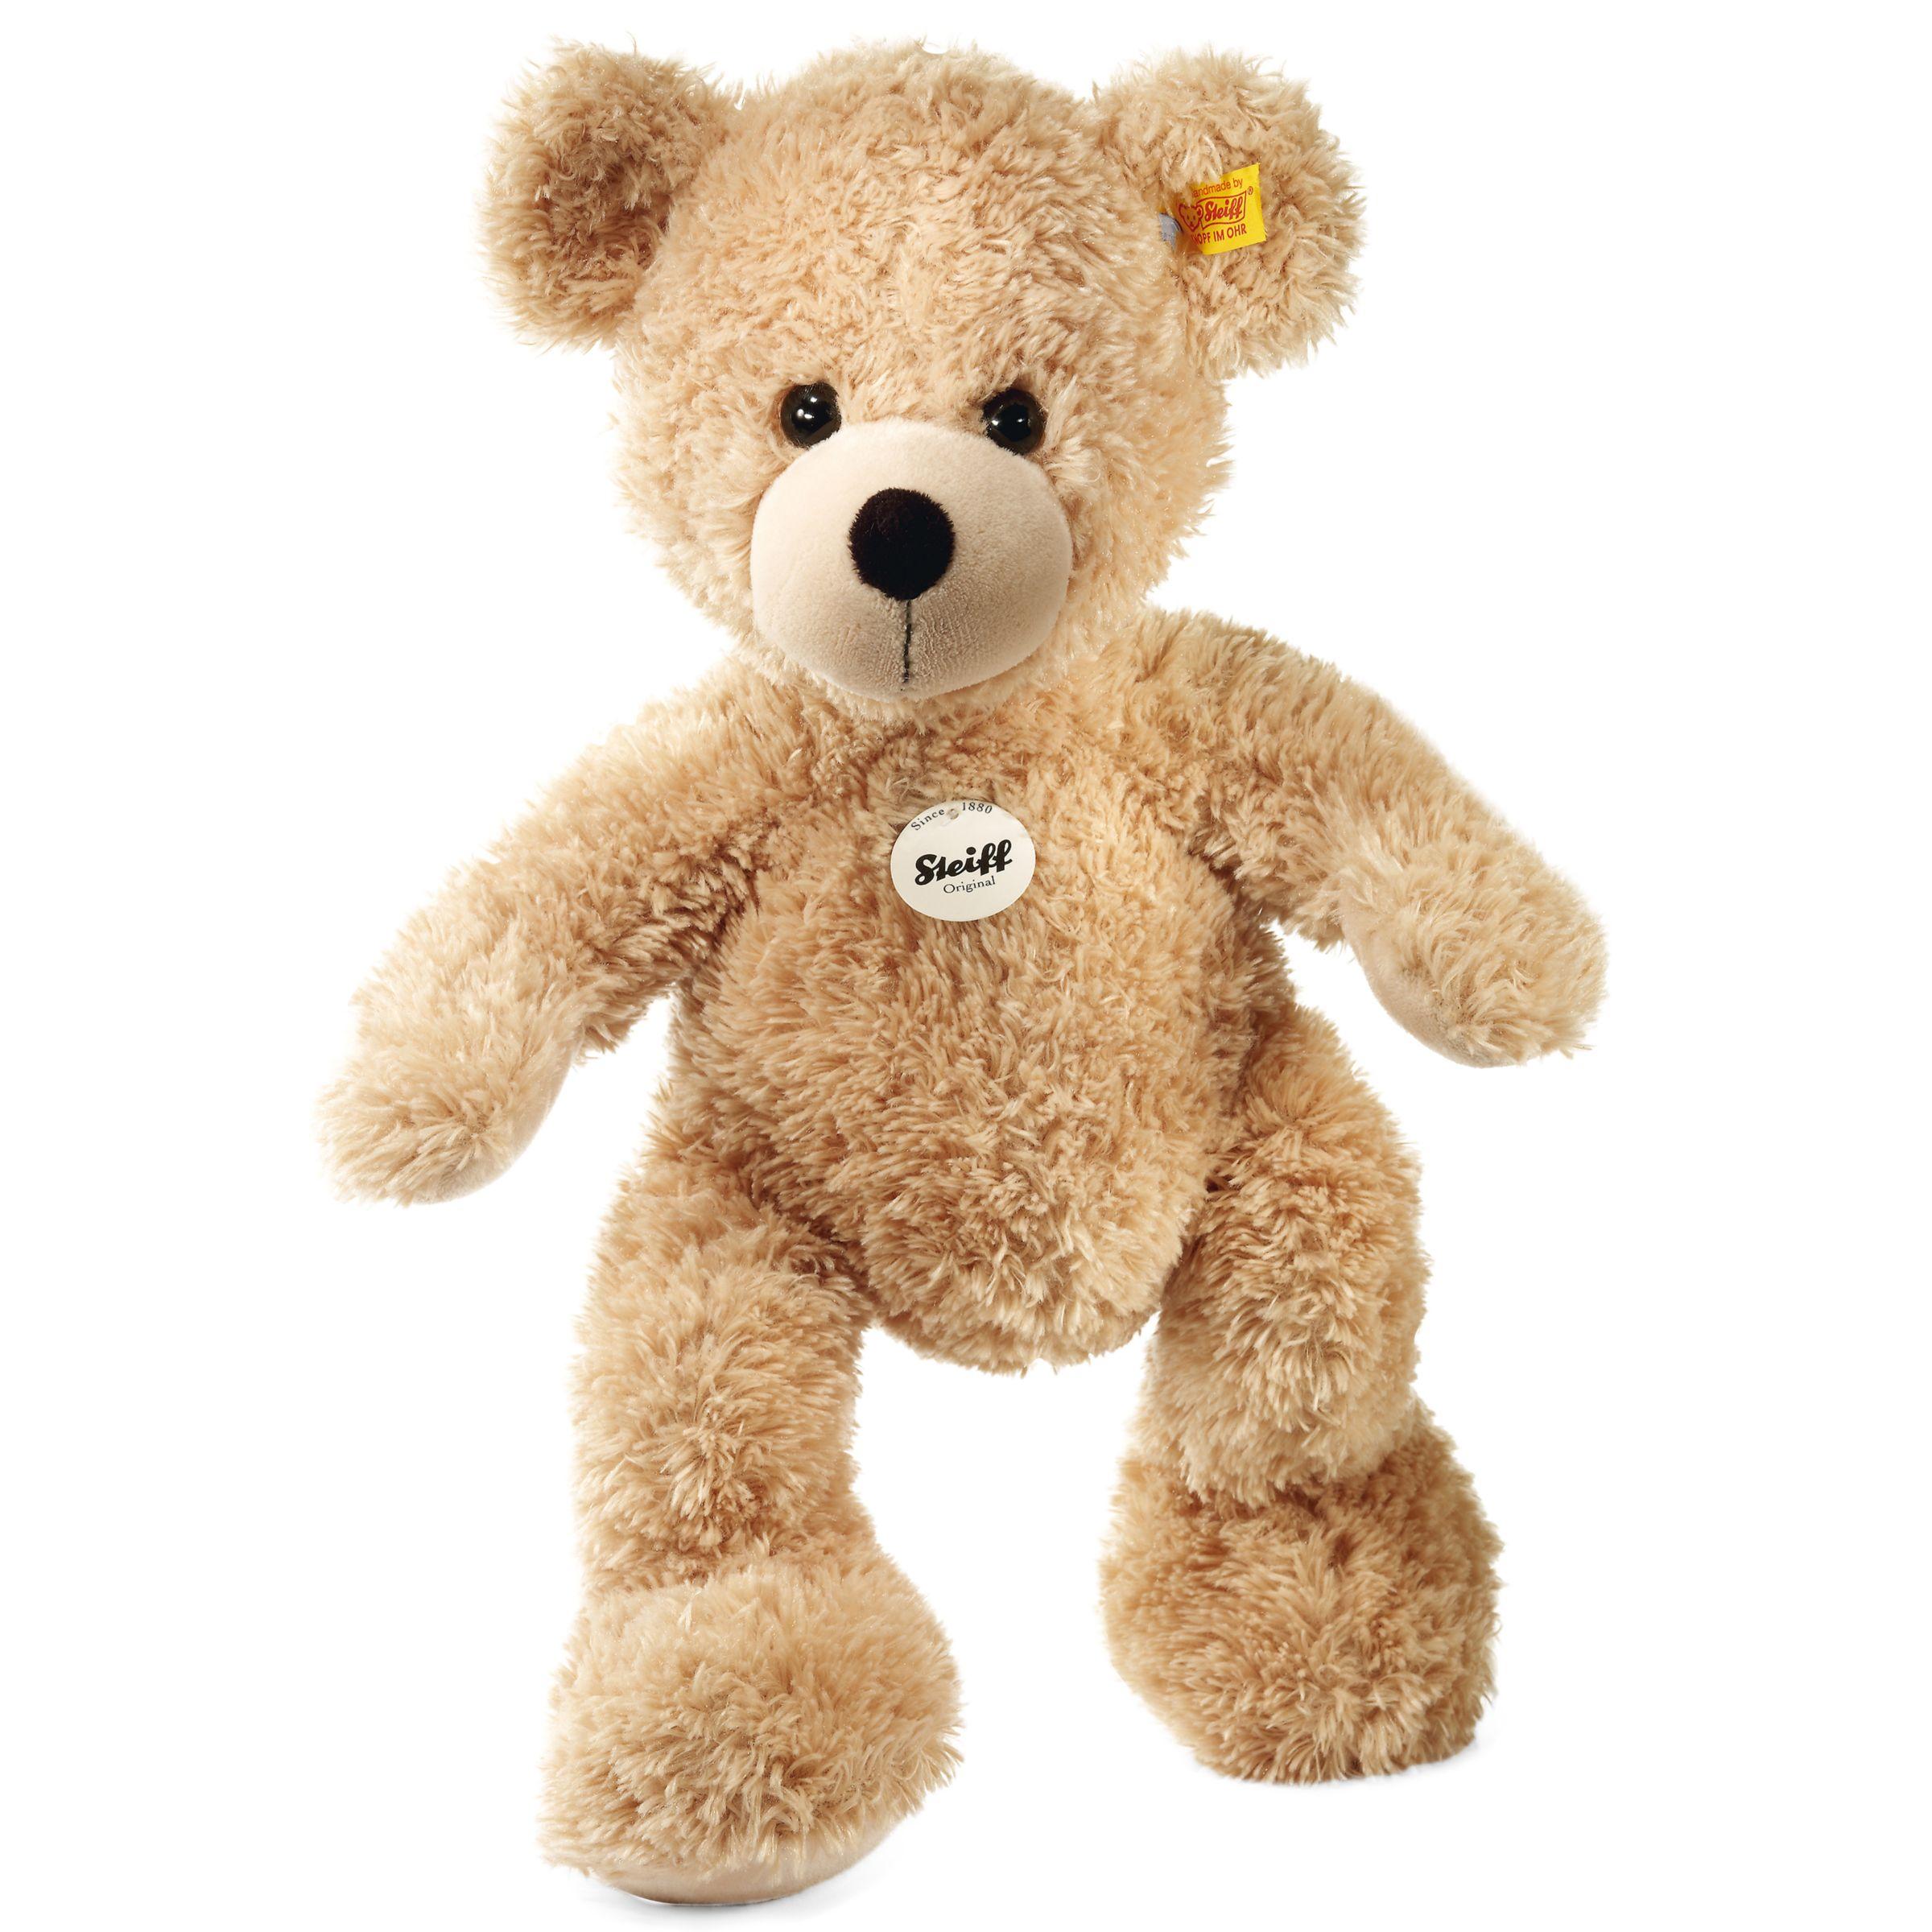 Steiff Steiff Fynn Teddy Bear, Beige, 40cm